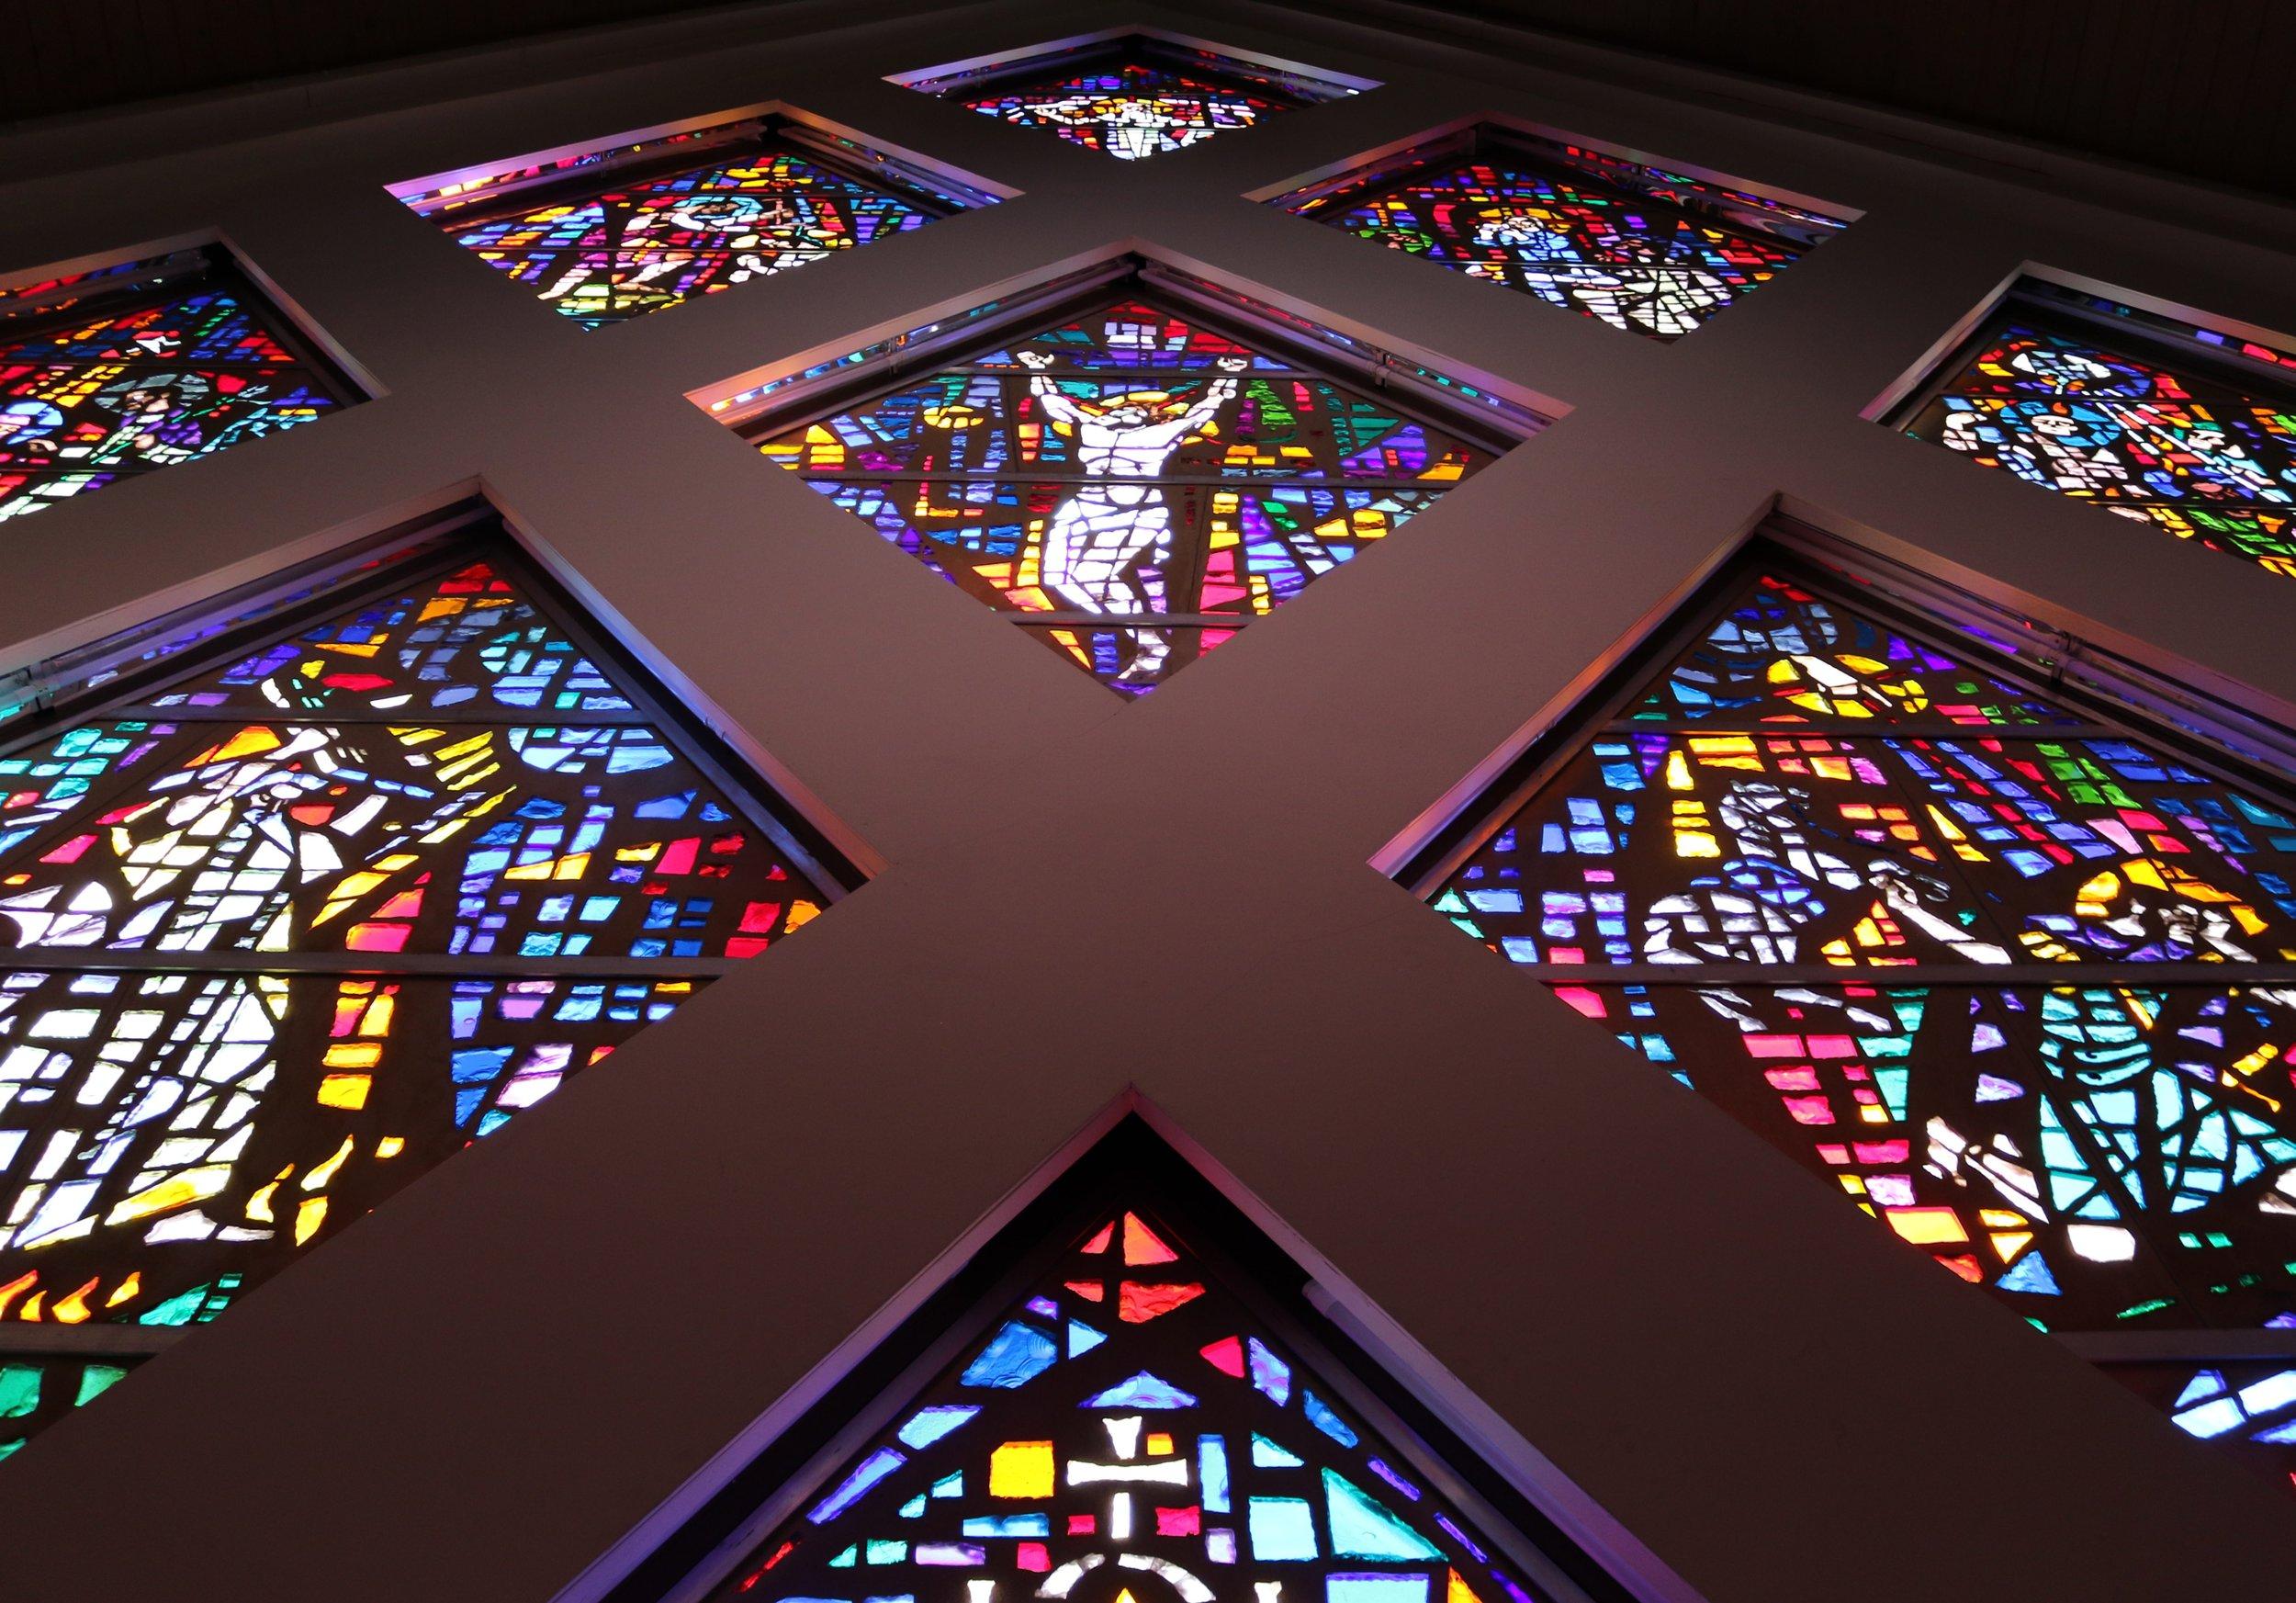 Christ Church UMC